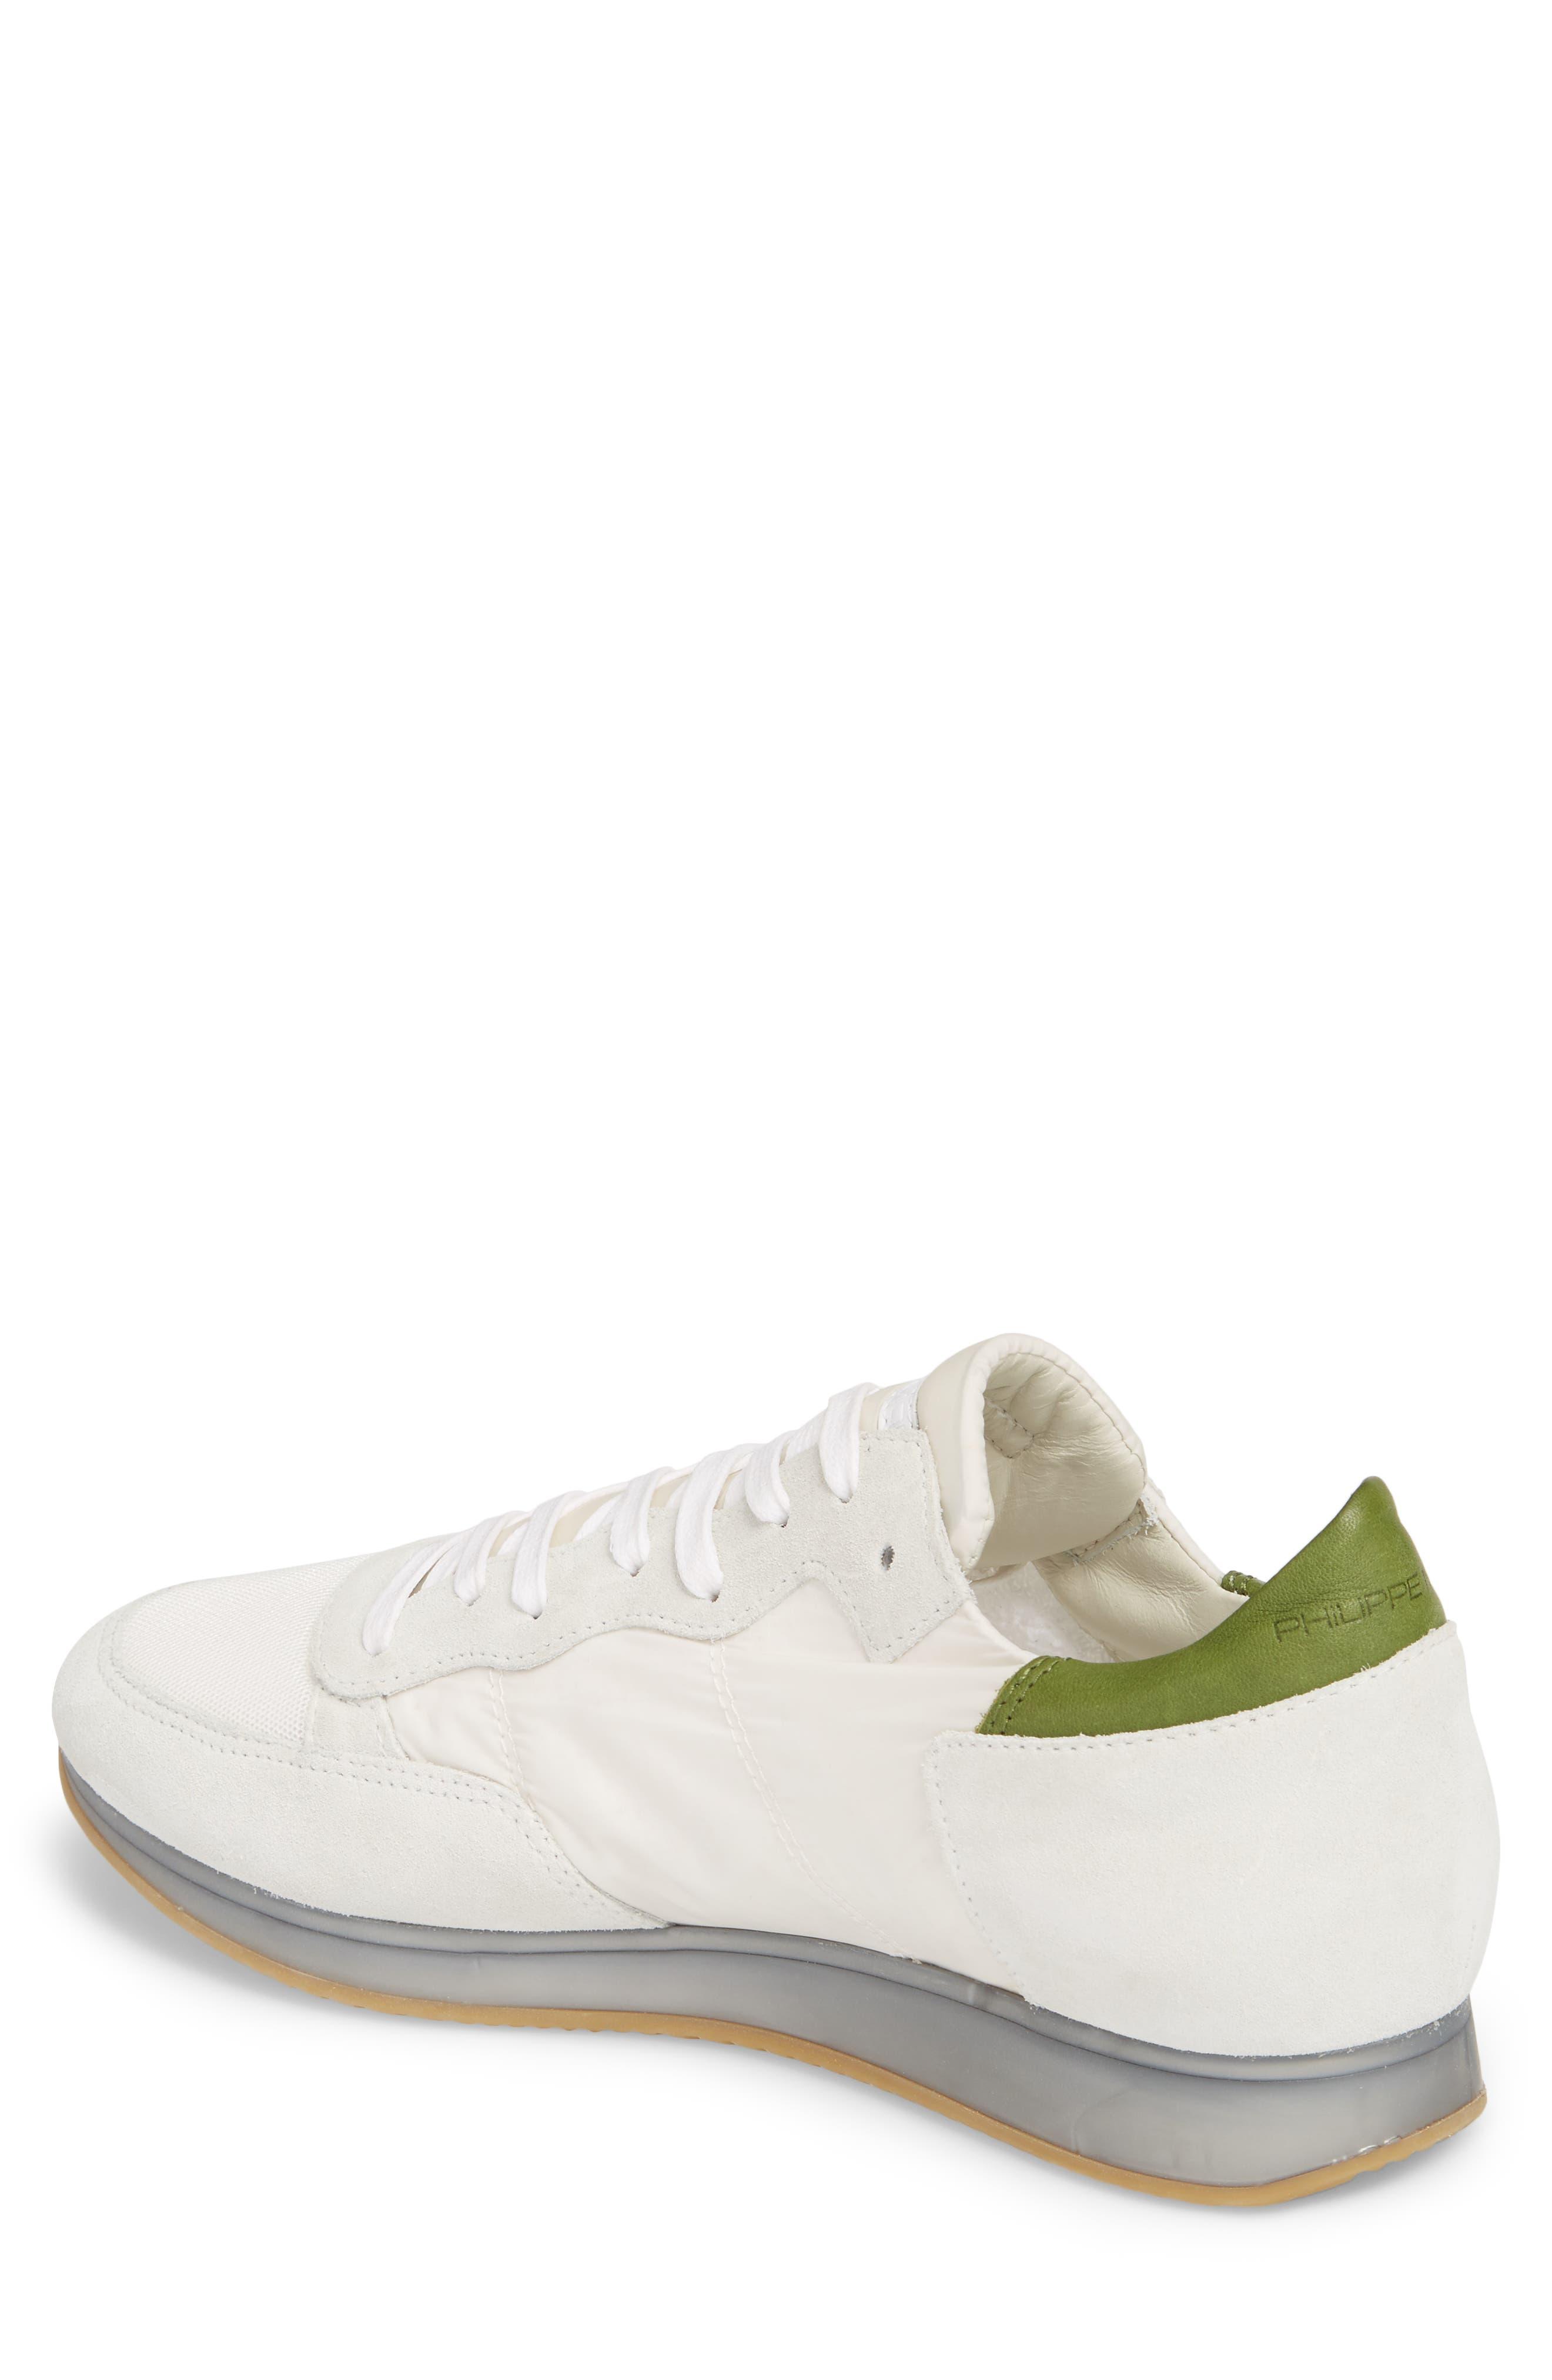 Tropez Sneaker,                             Alternate thumbnail 2, color,                             White/ Green